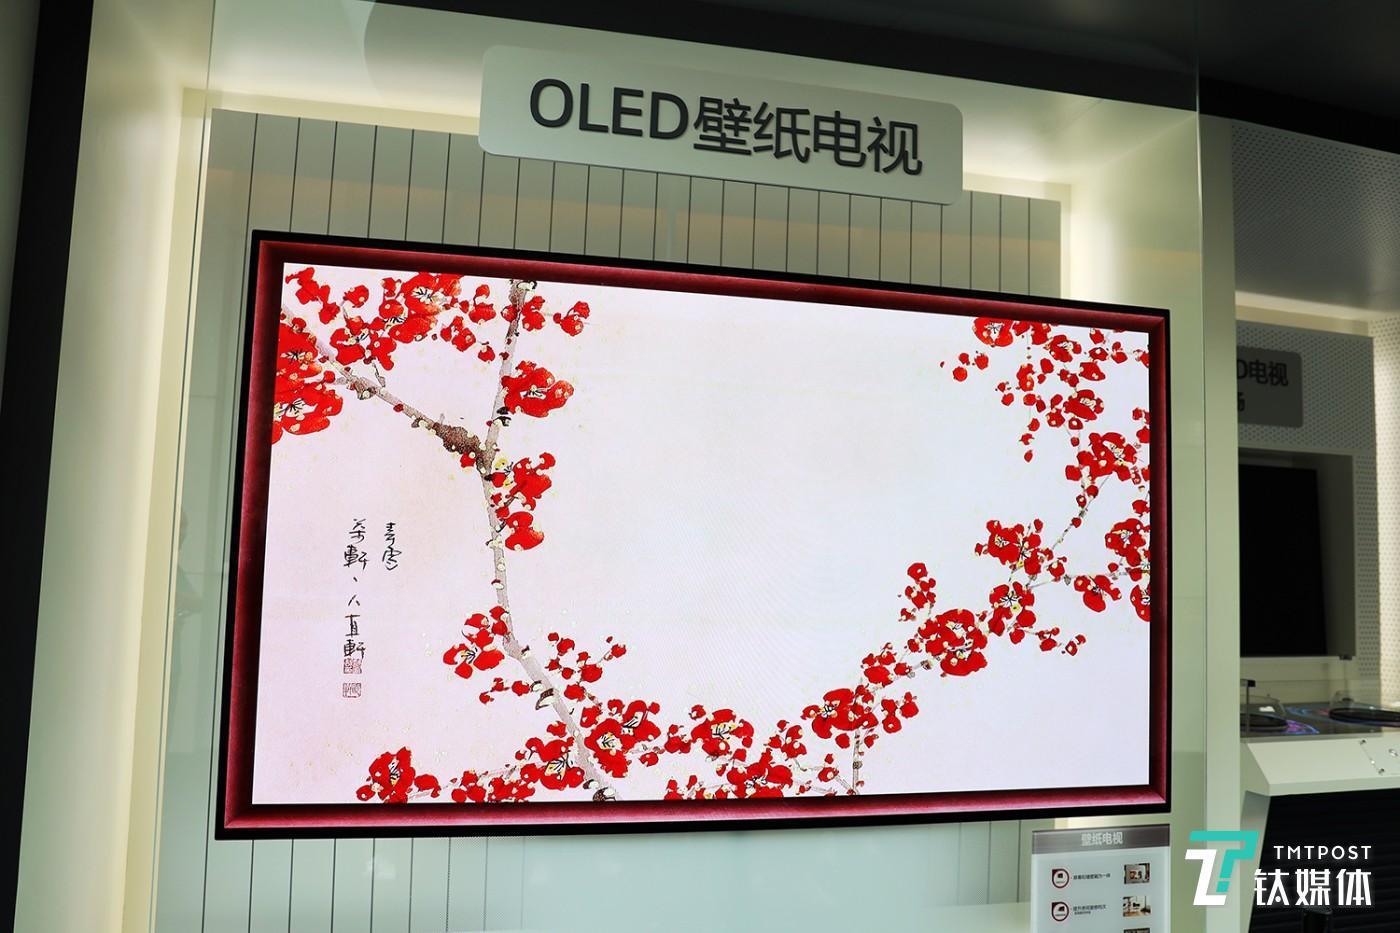 LGD OLED壁纸电视